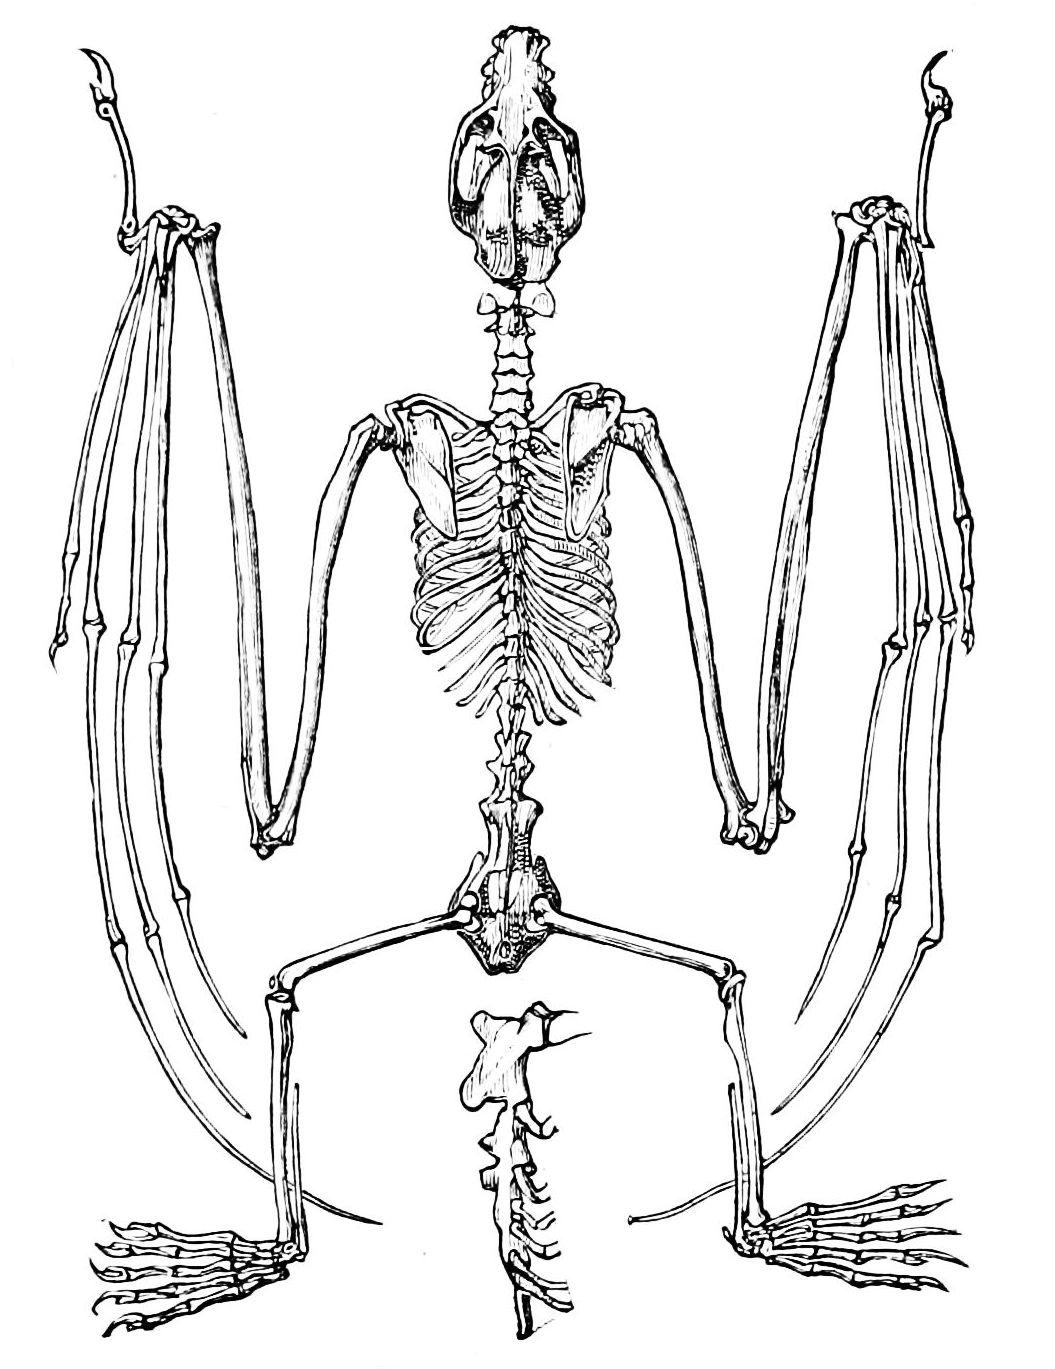 Canine Foot Anatomy